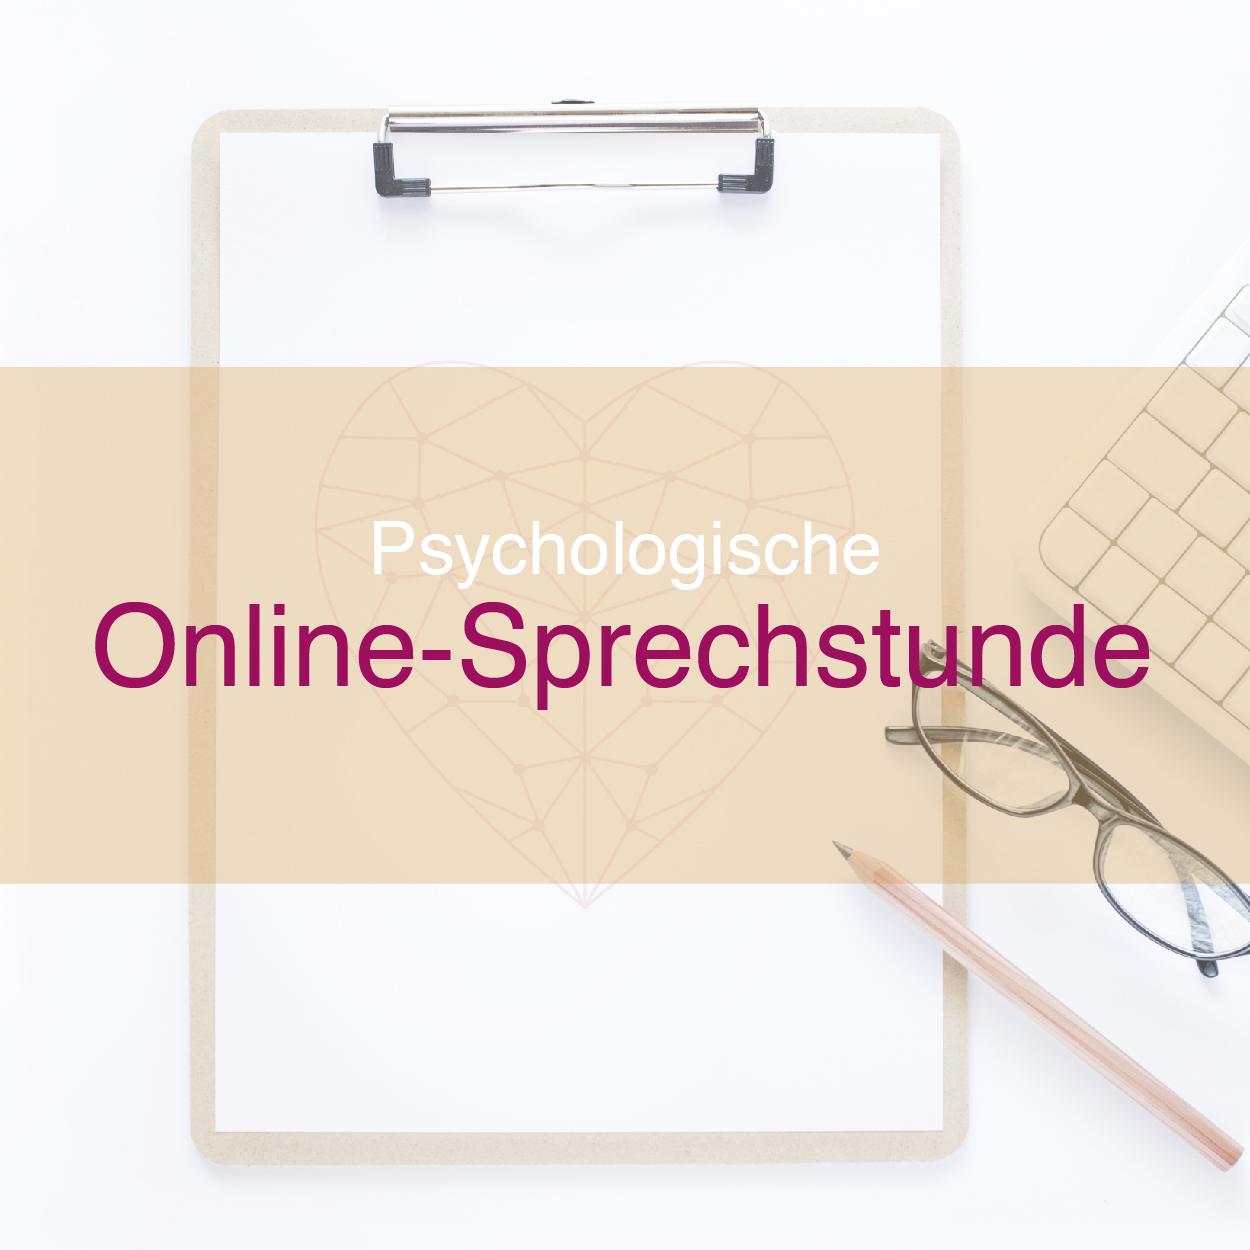 Psychologische Online Sprechstunde